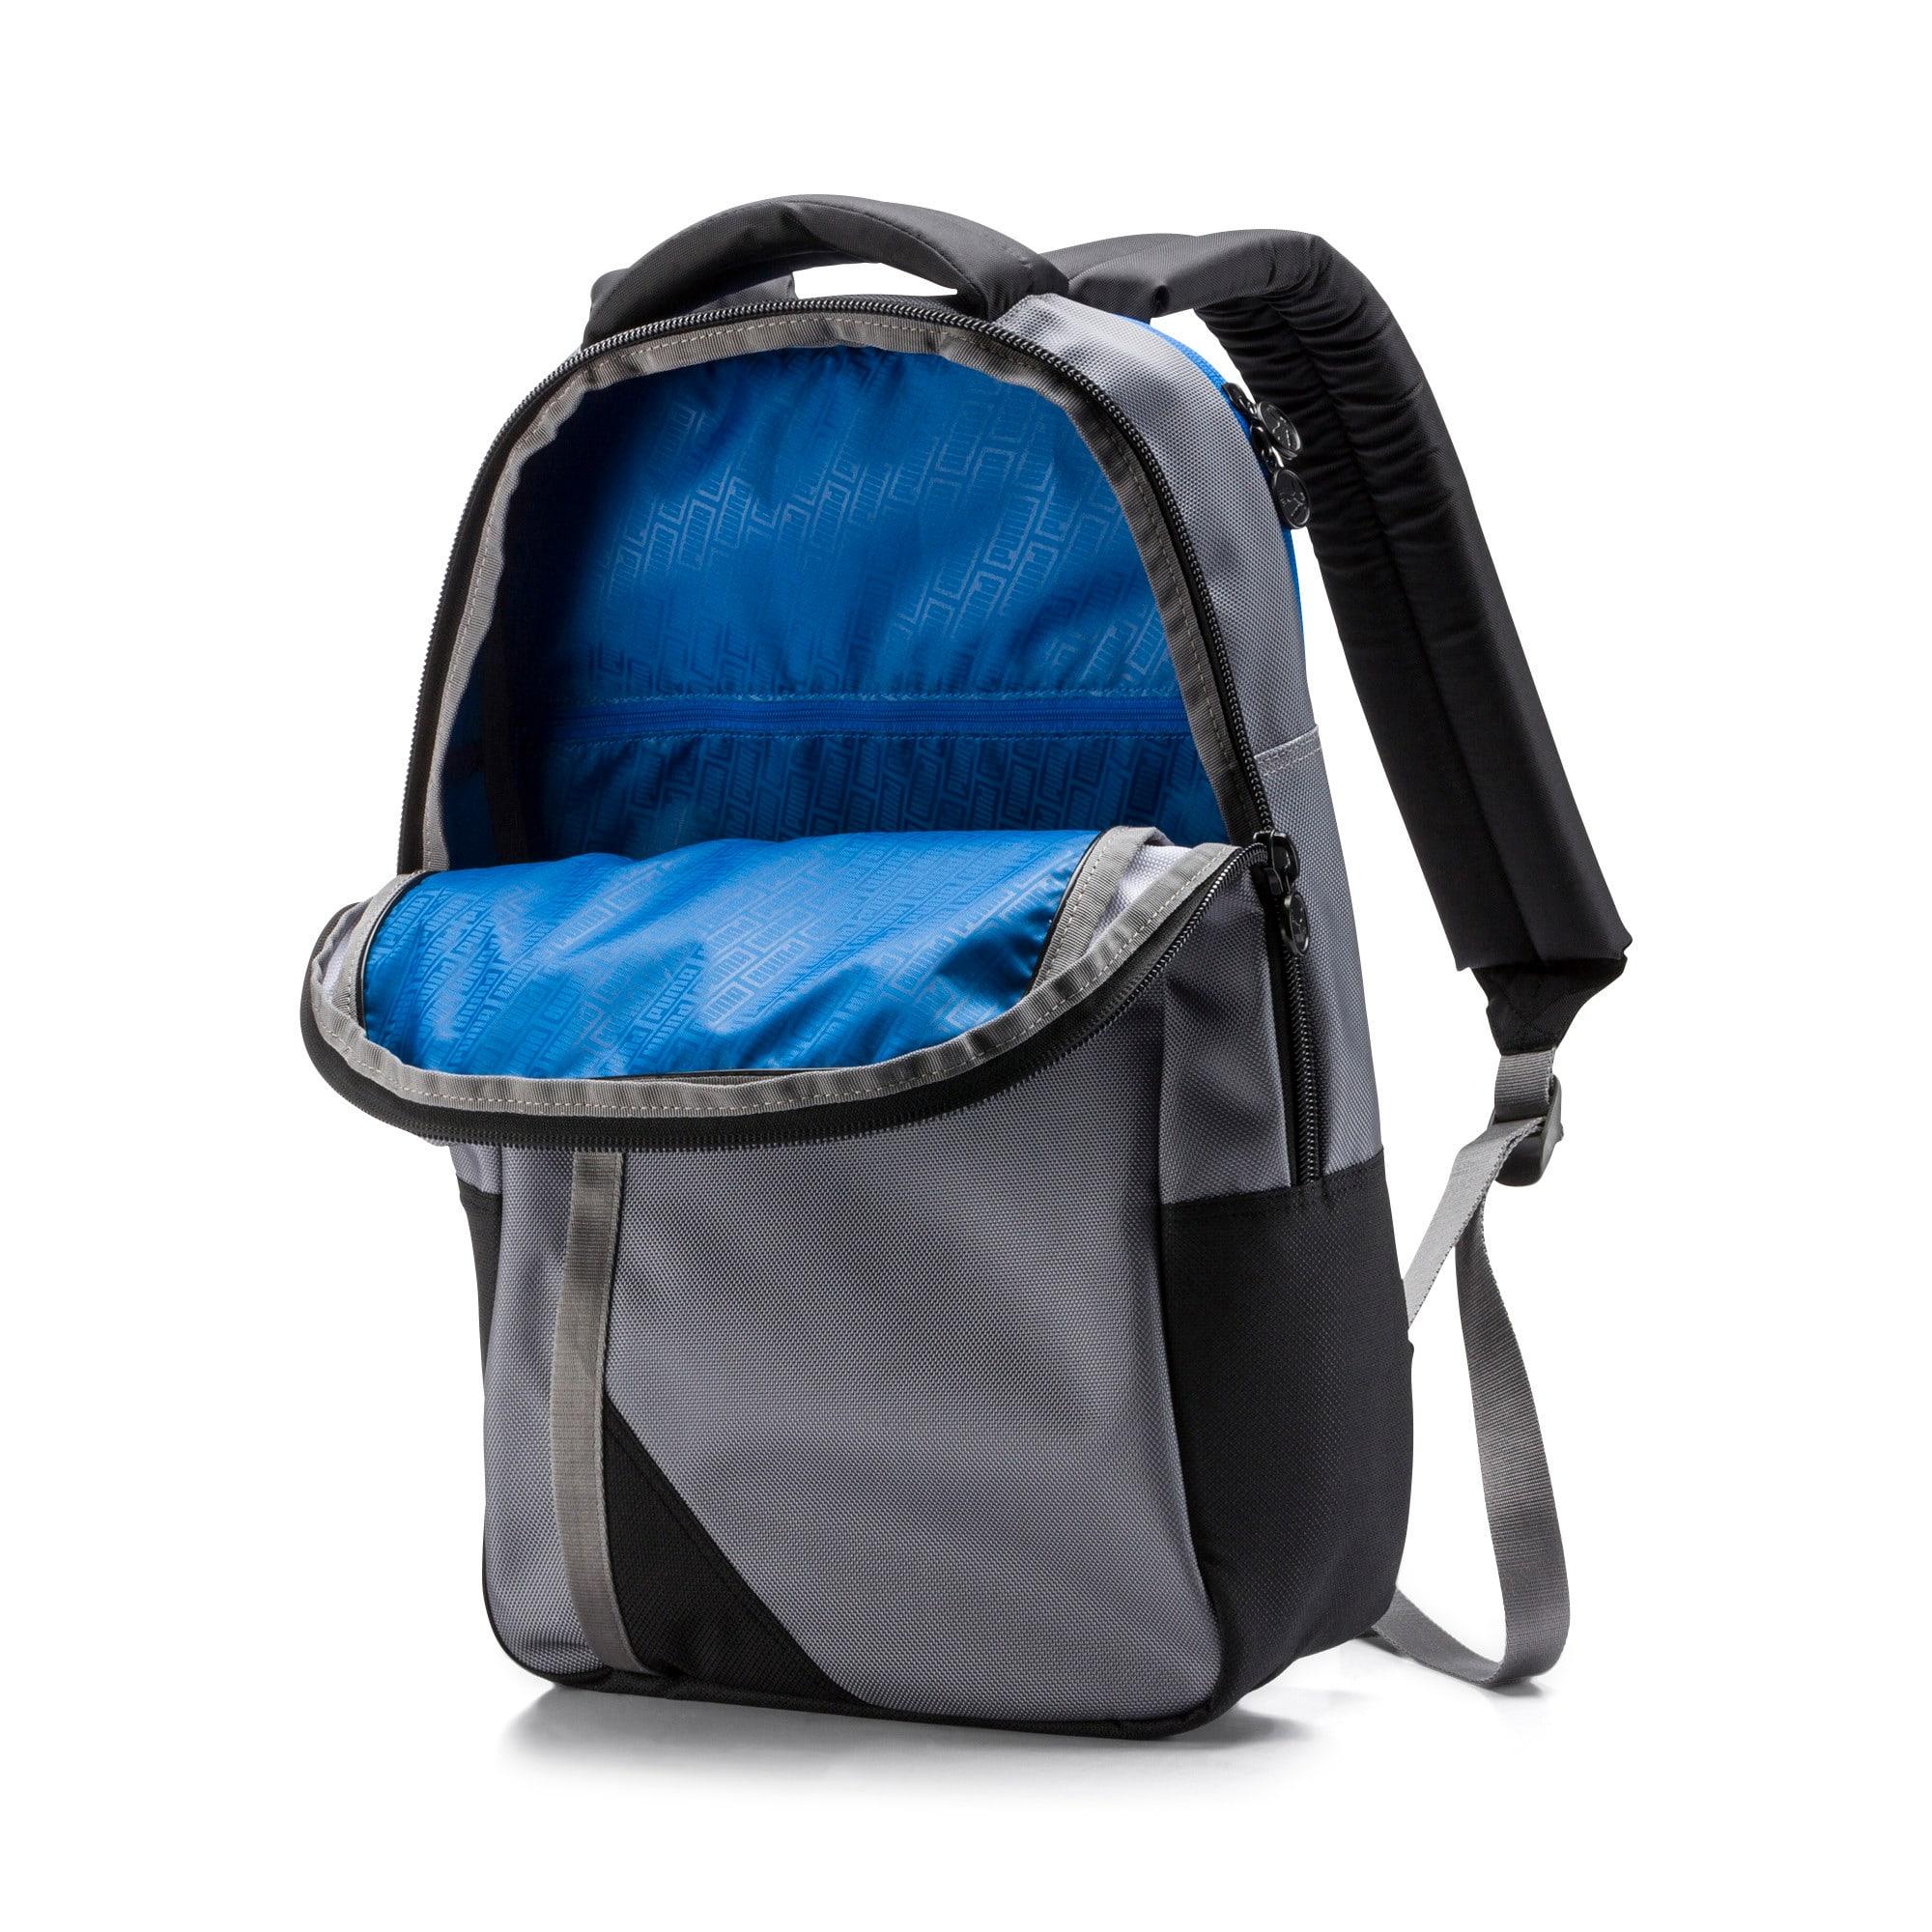 Thumbnail 3 of RS-X Backpack, Charcoal Gray, medium